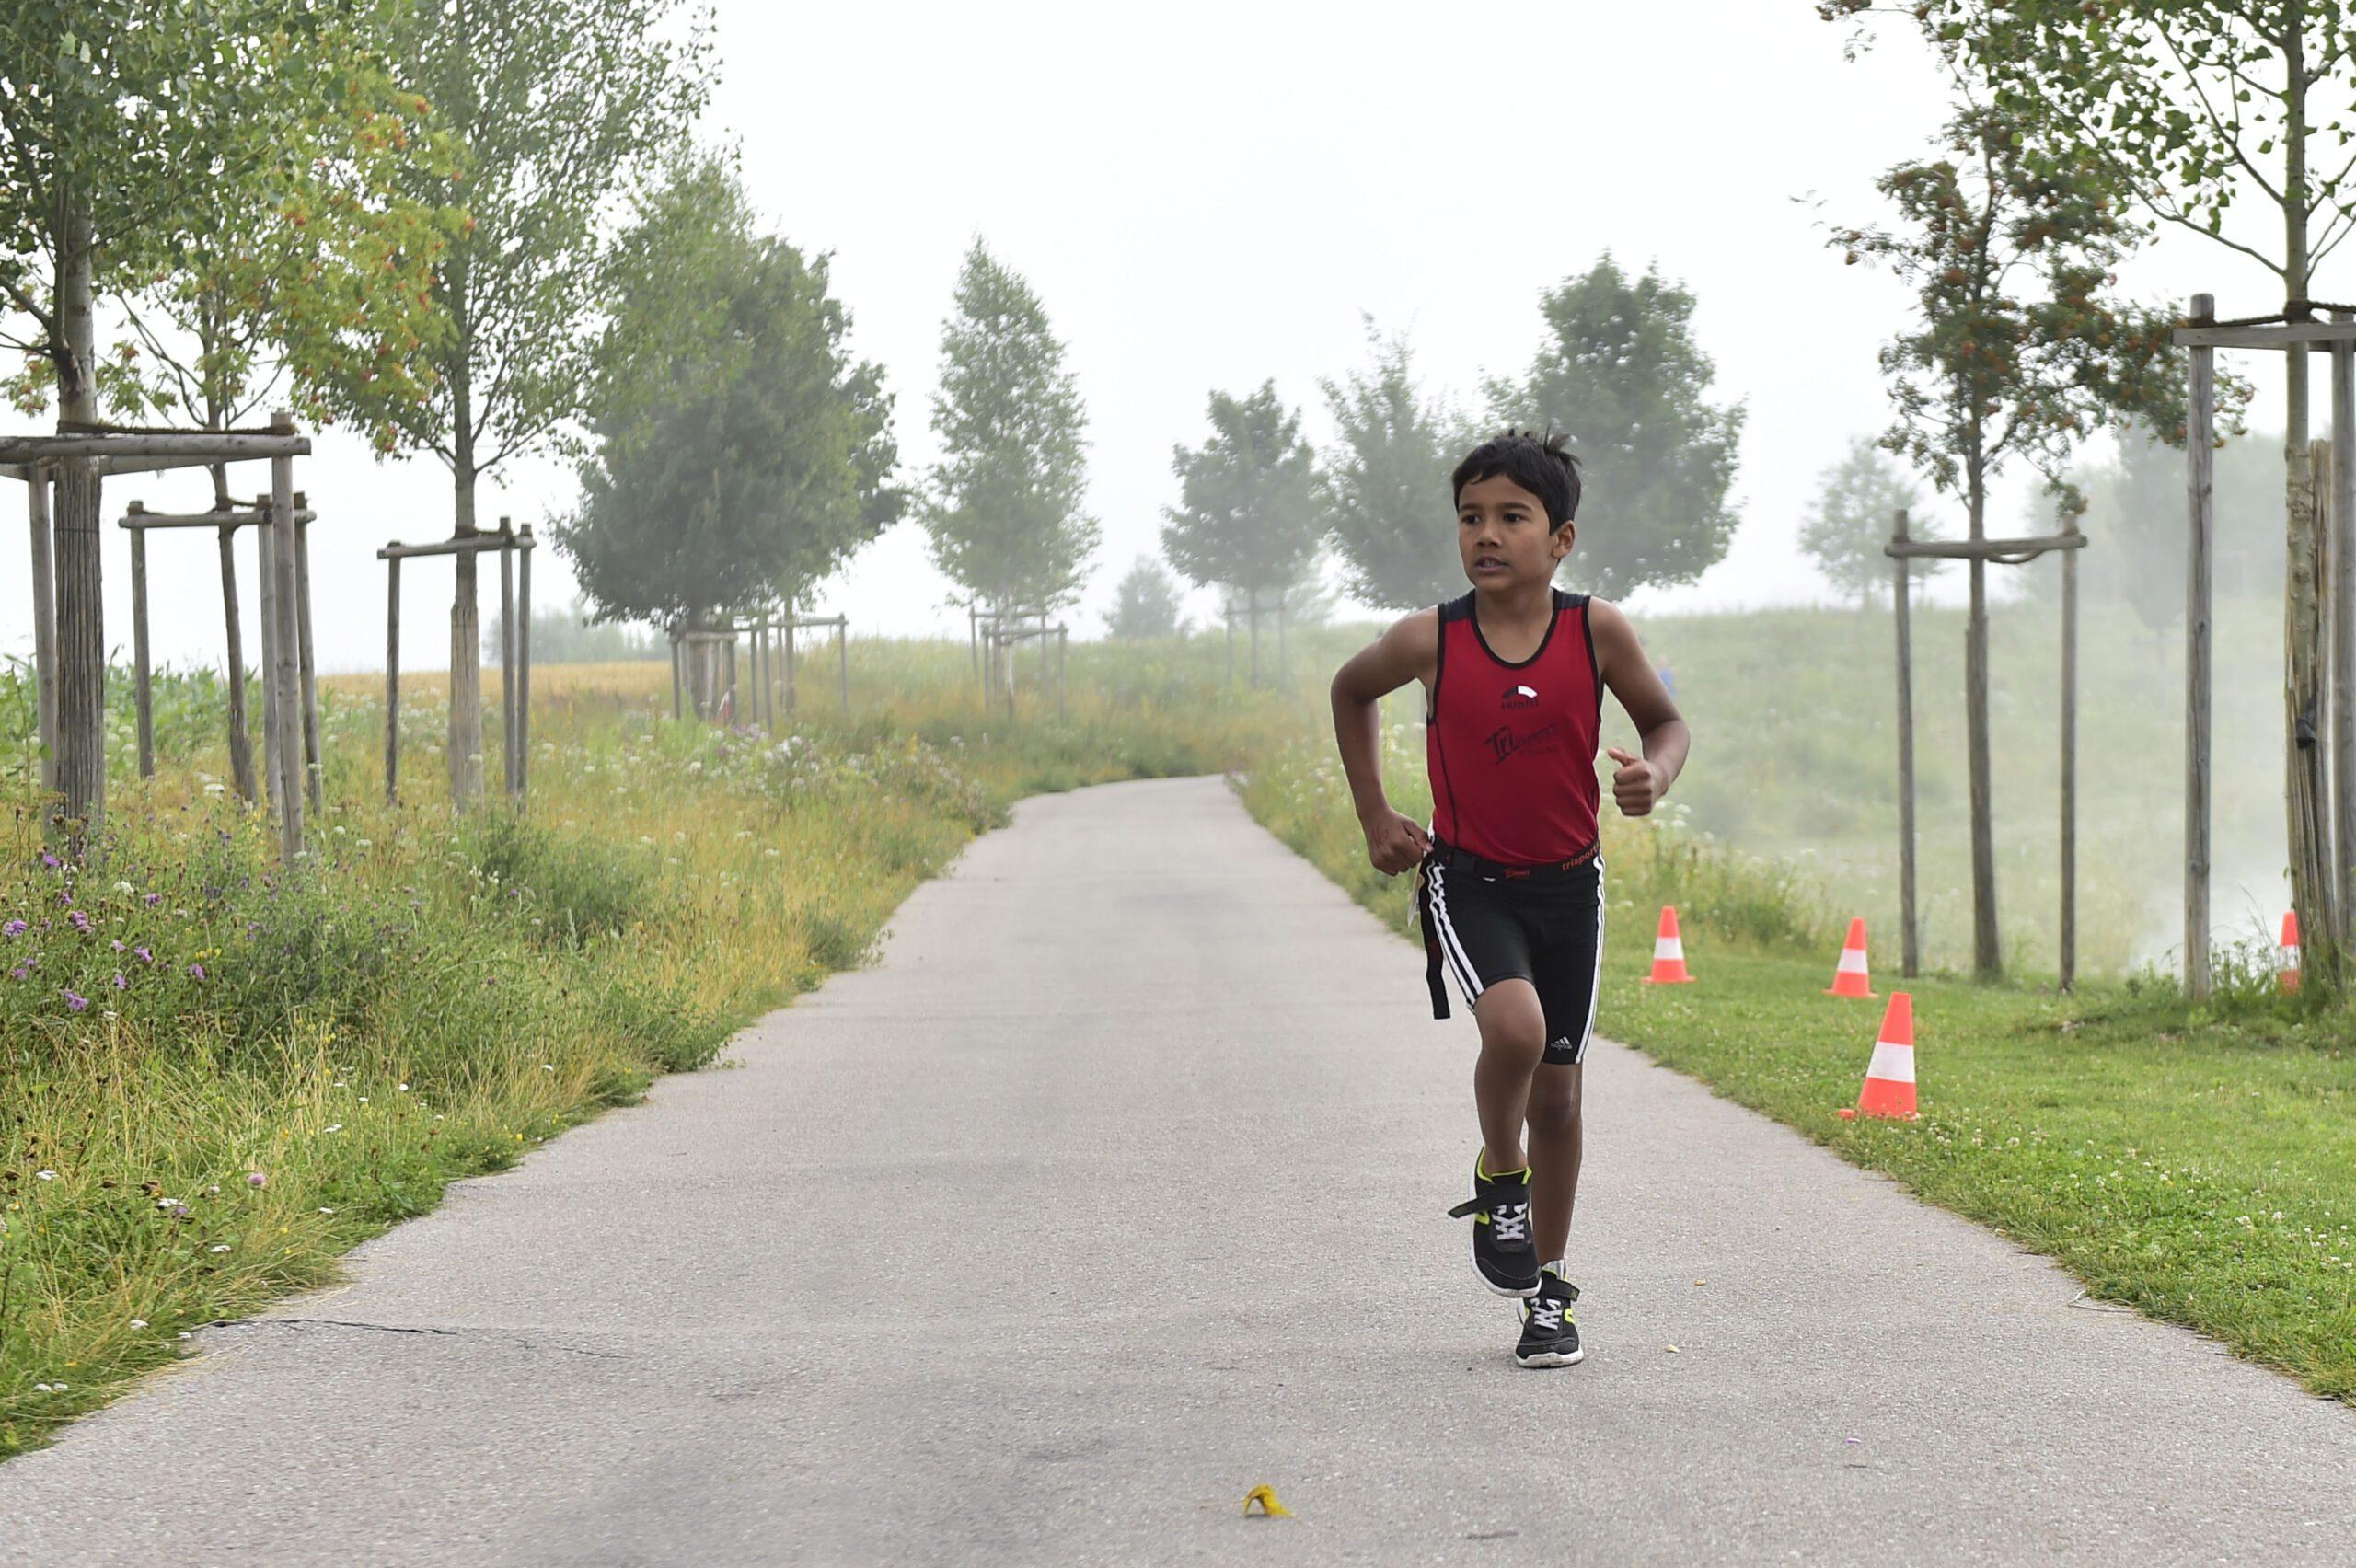 Laufen, Laufen, Laufen!